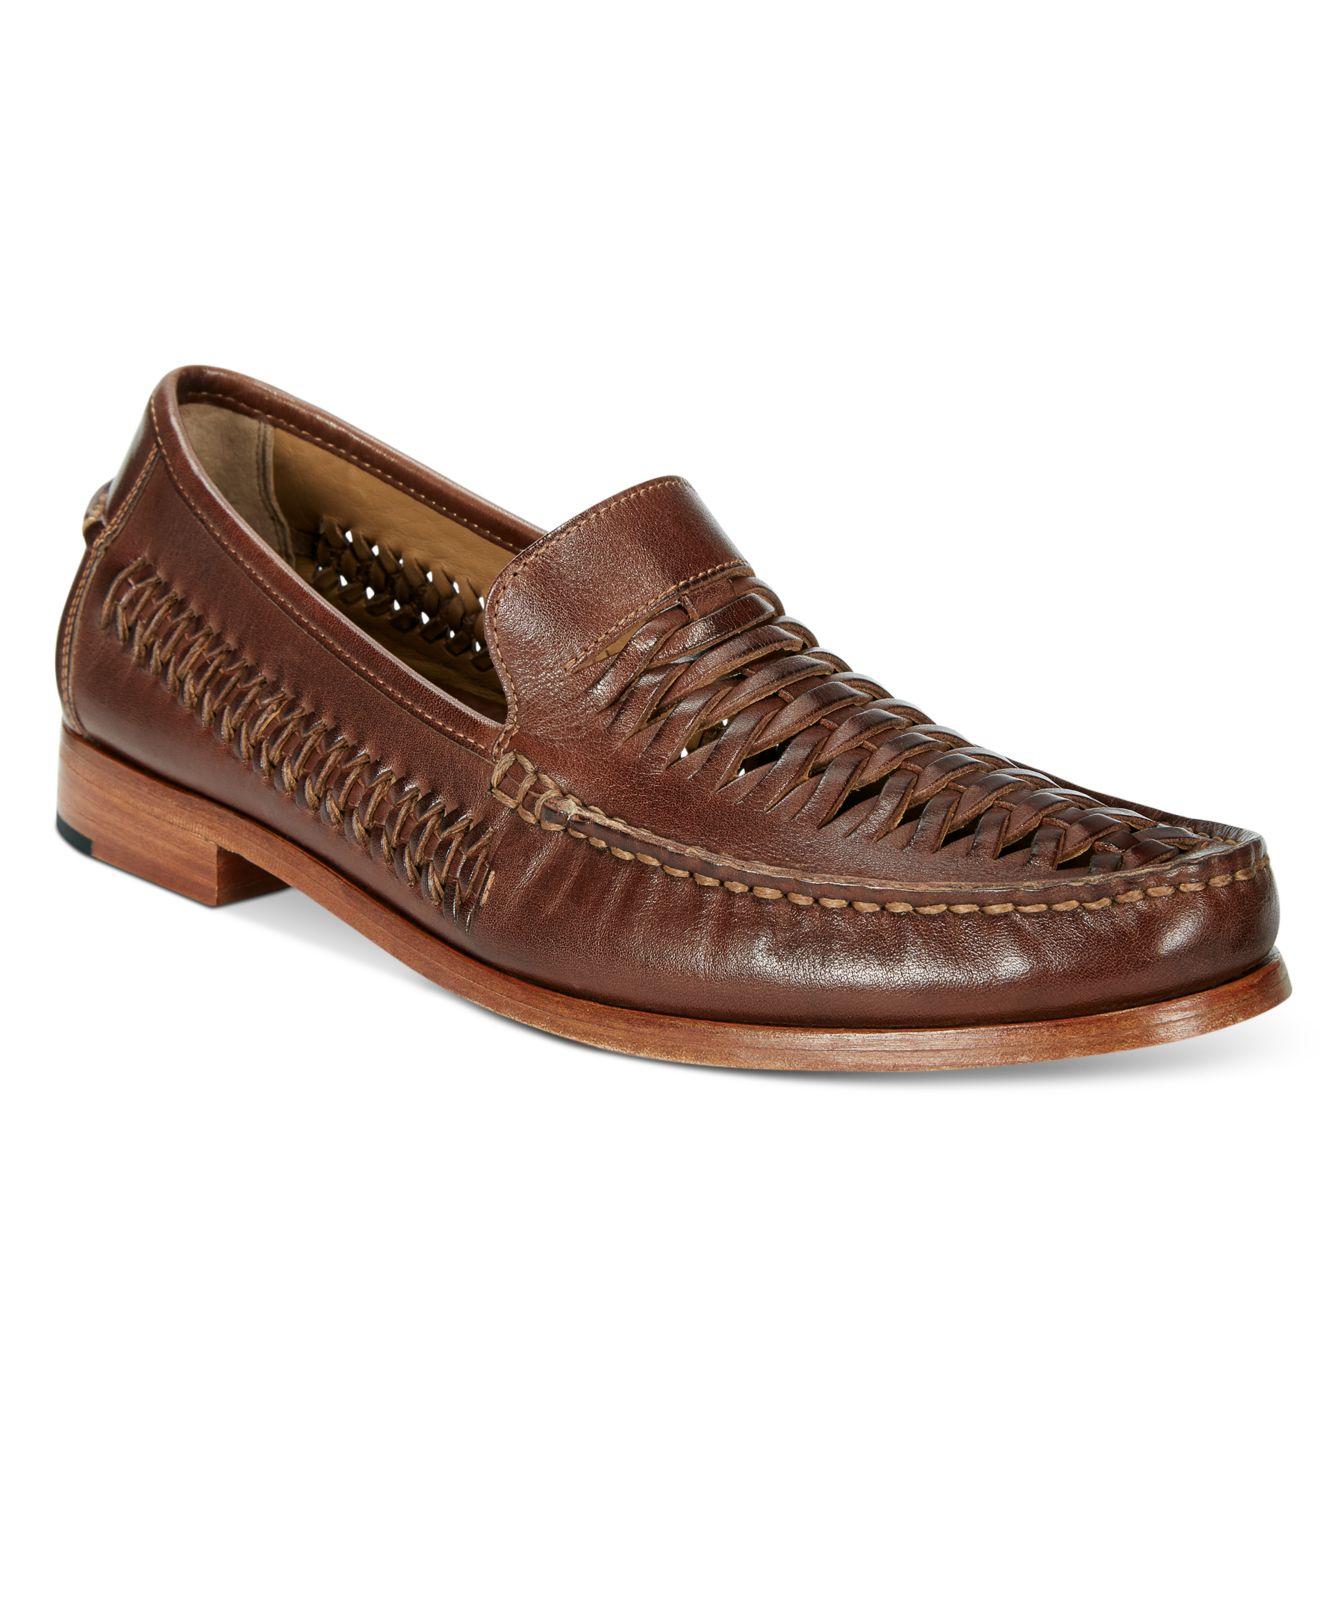 Johnston Amp Murphy Men S Danbury Woven Venetian Loafers In